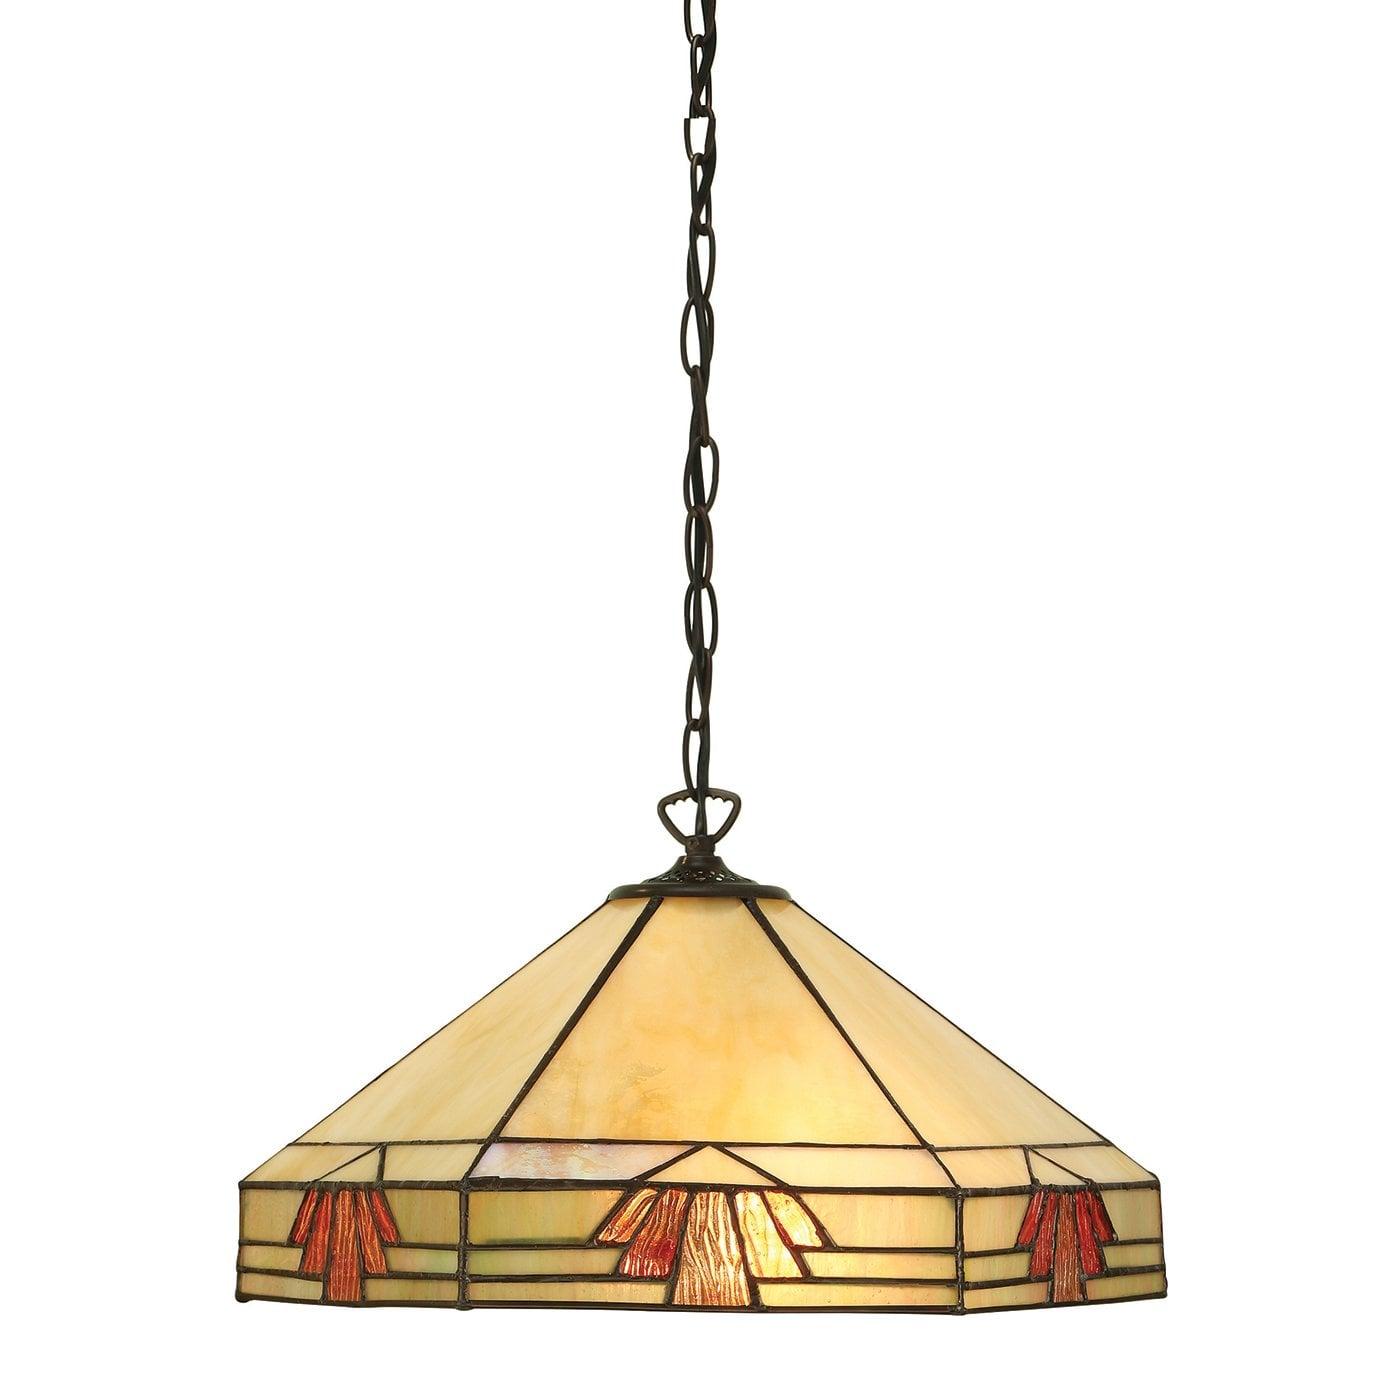 Interiors 1900 64285 Nevada Medium 1lt pendant, Tiffany